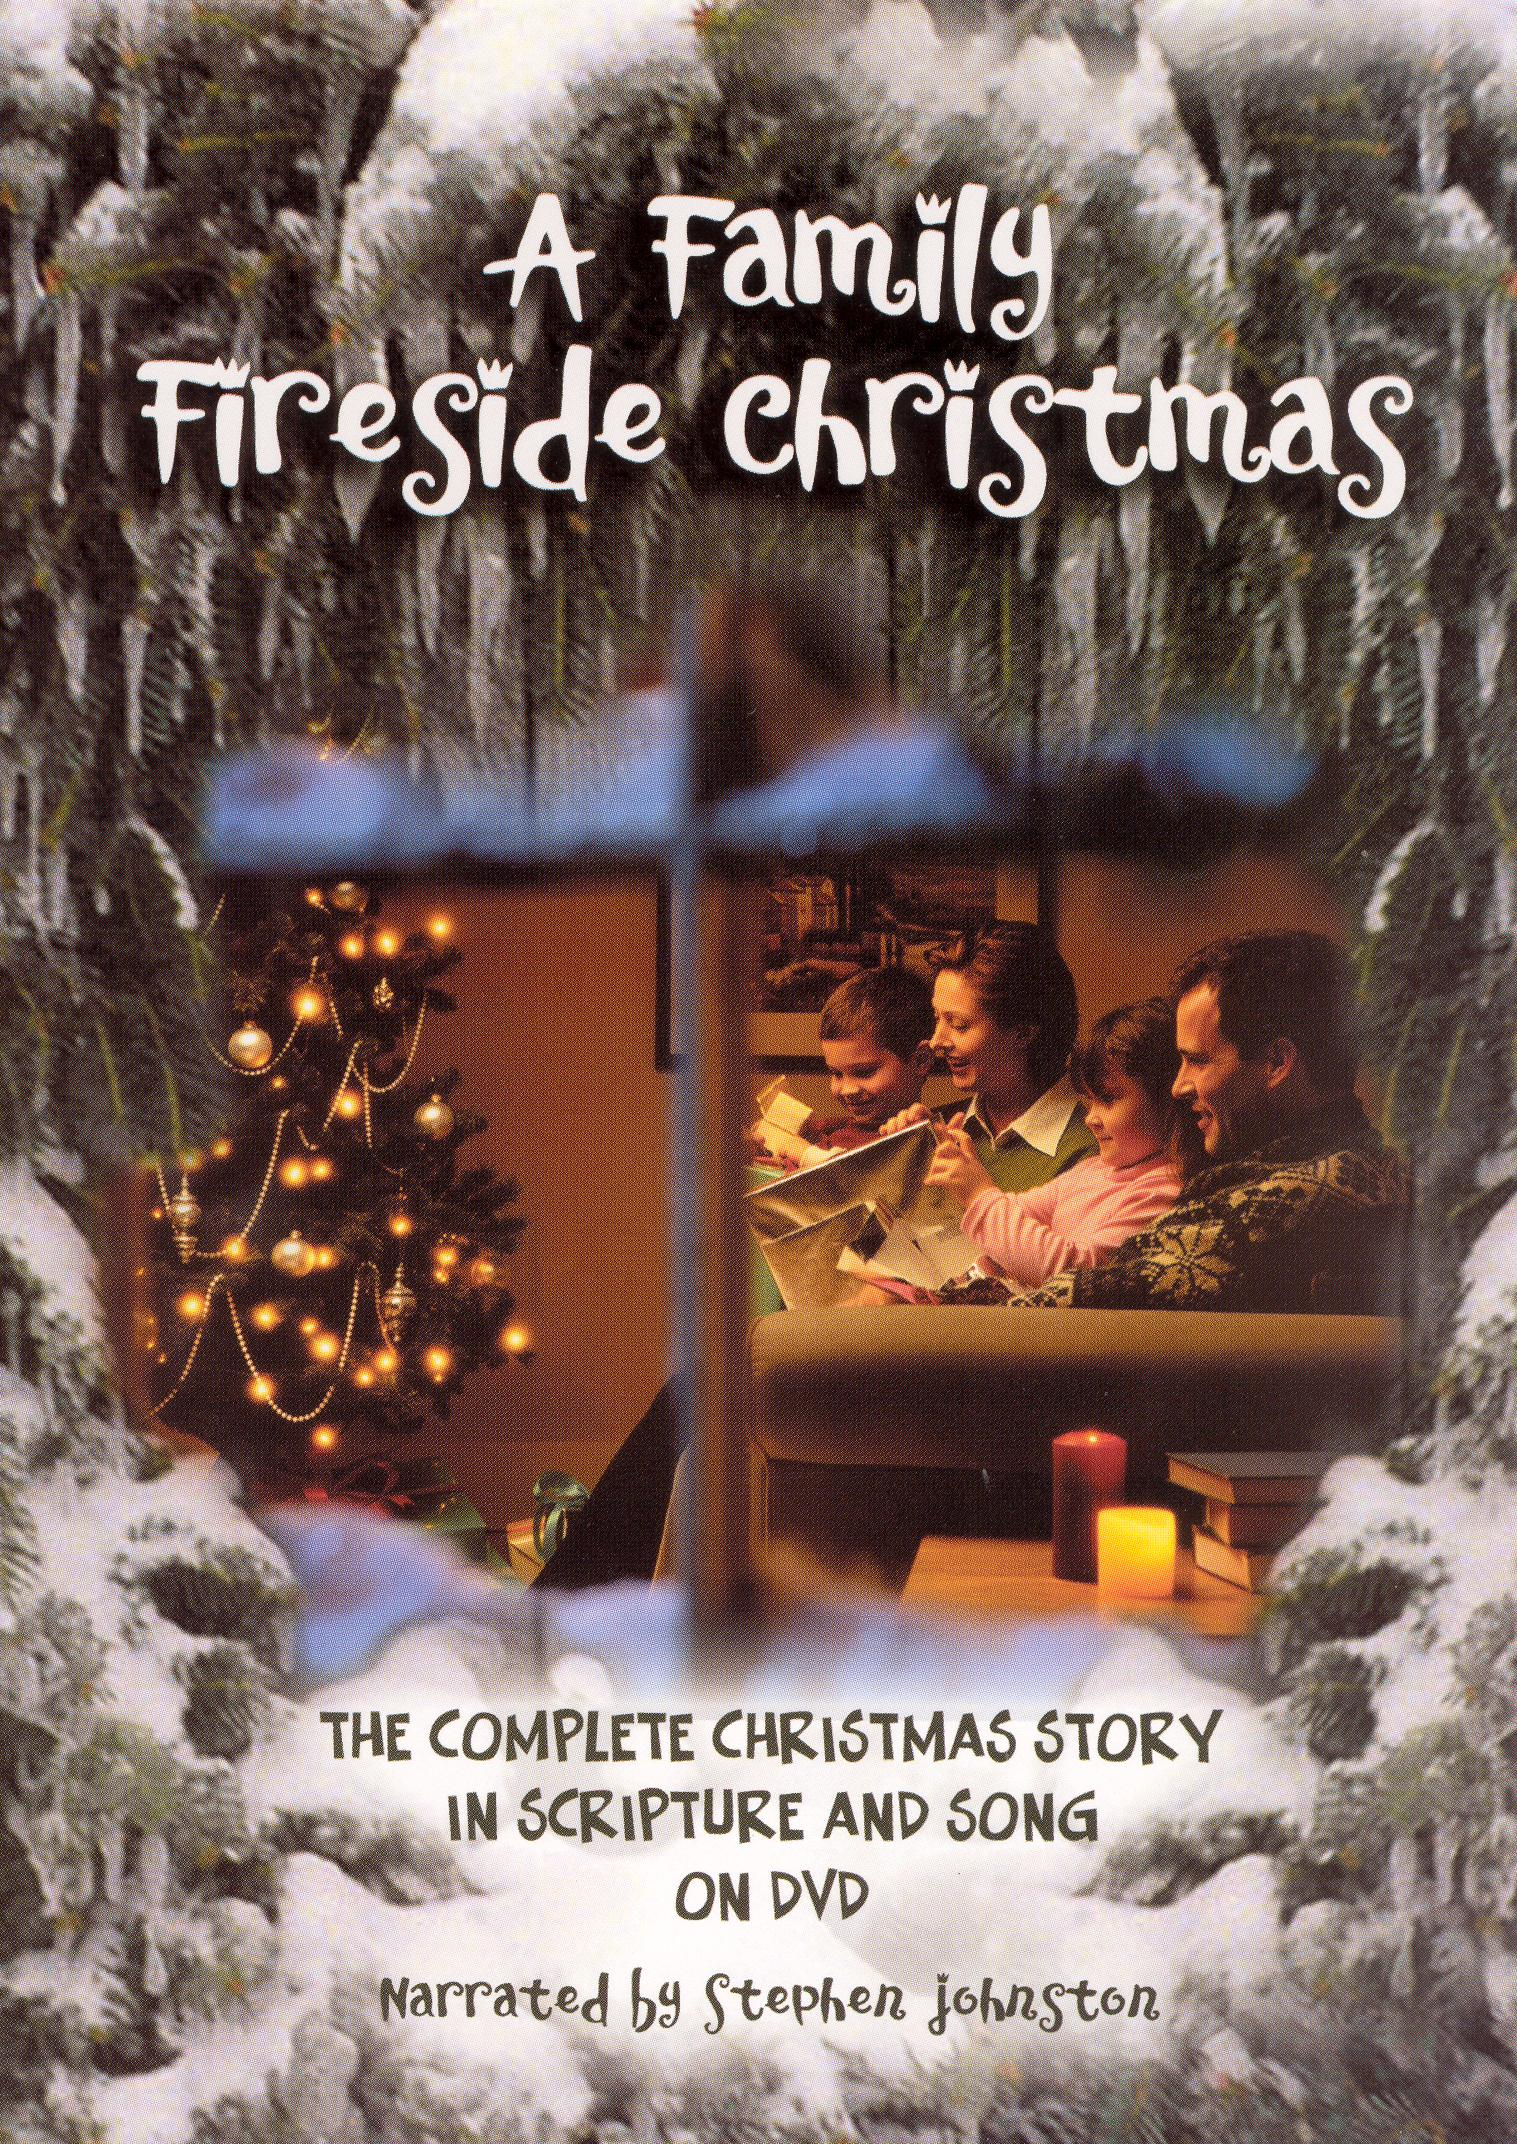 A Family Fireside Christmas